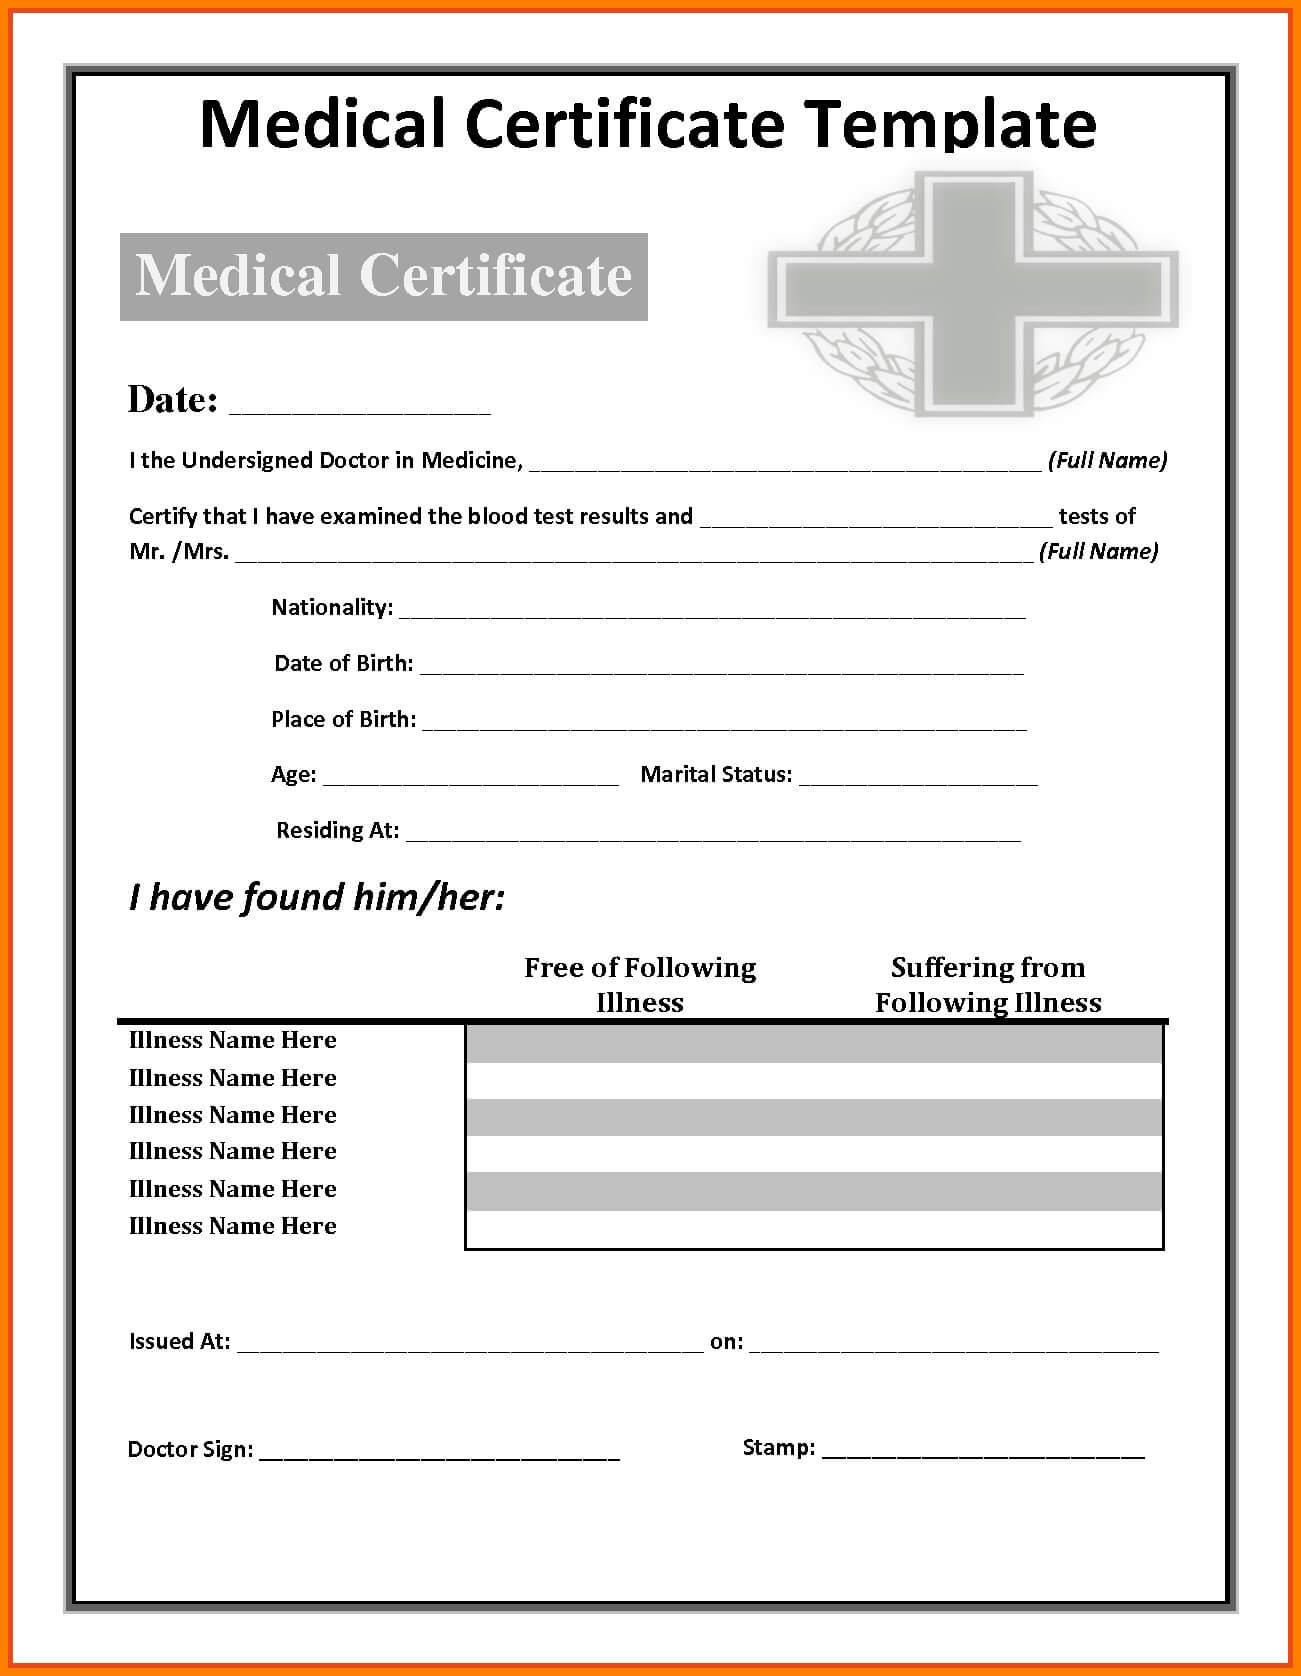 Fake Medical Certificate Template Download Within Fake Medical Certificate Template Download